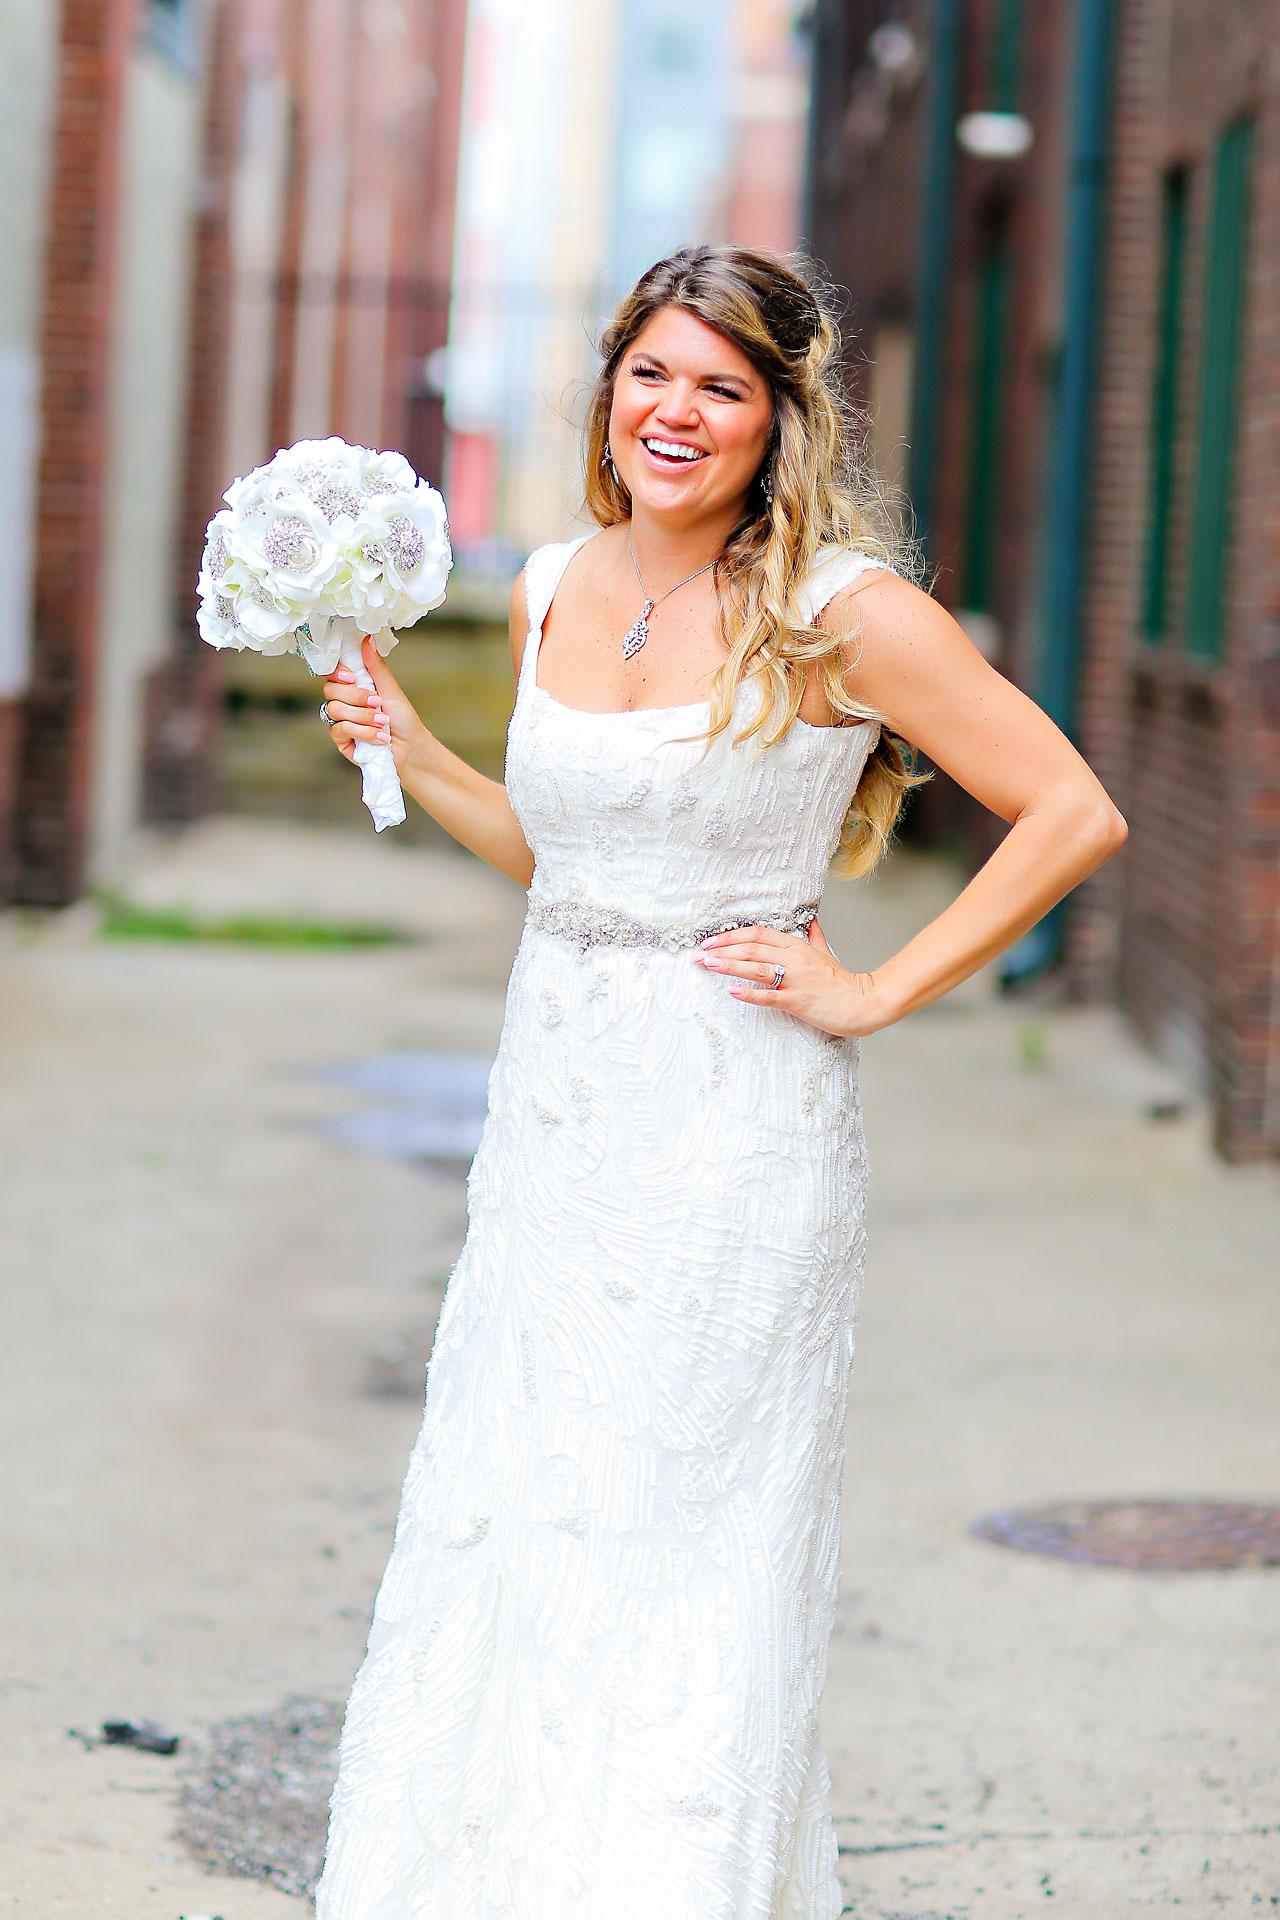 Amy Nick Canal 337 Wedding 096